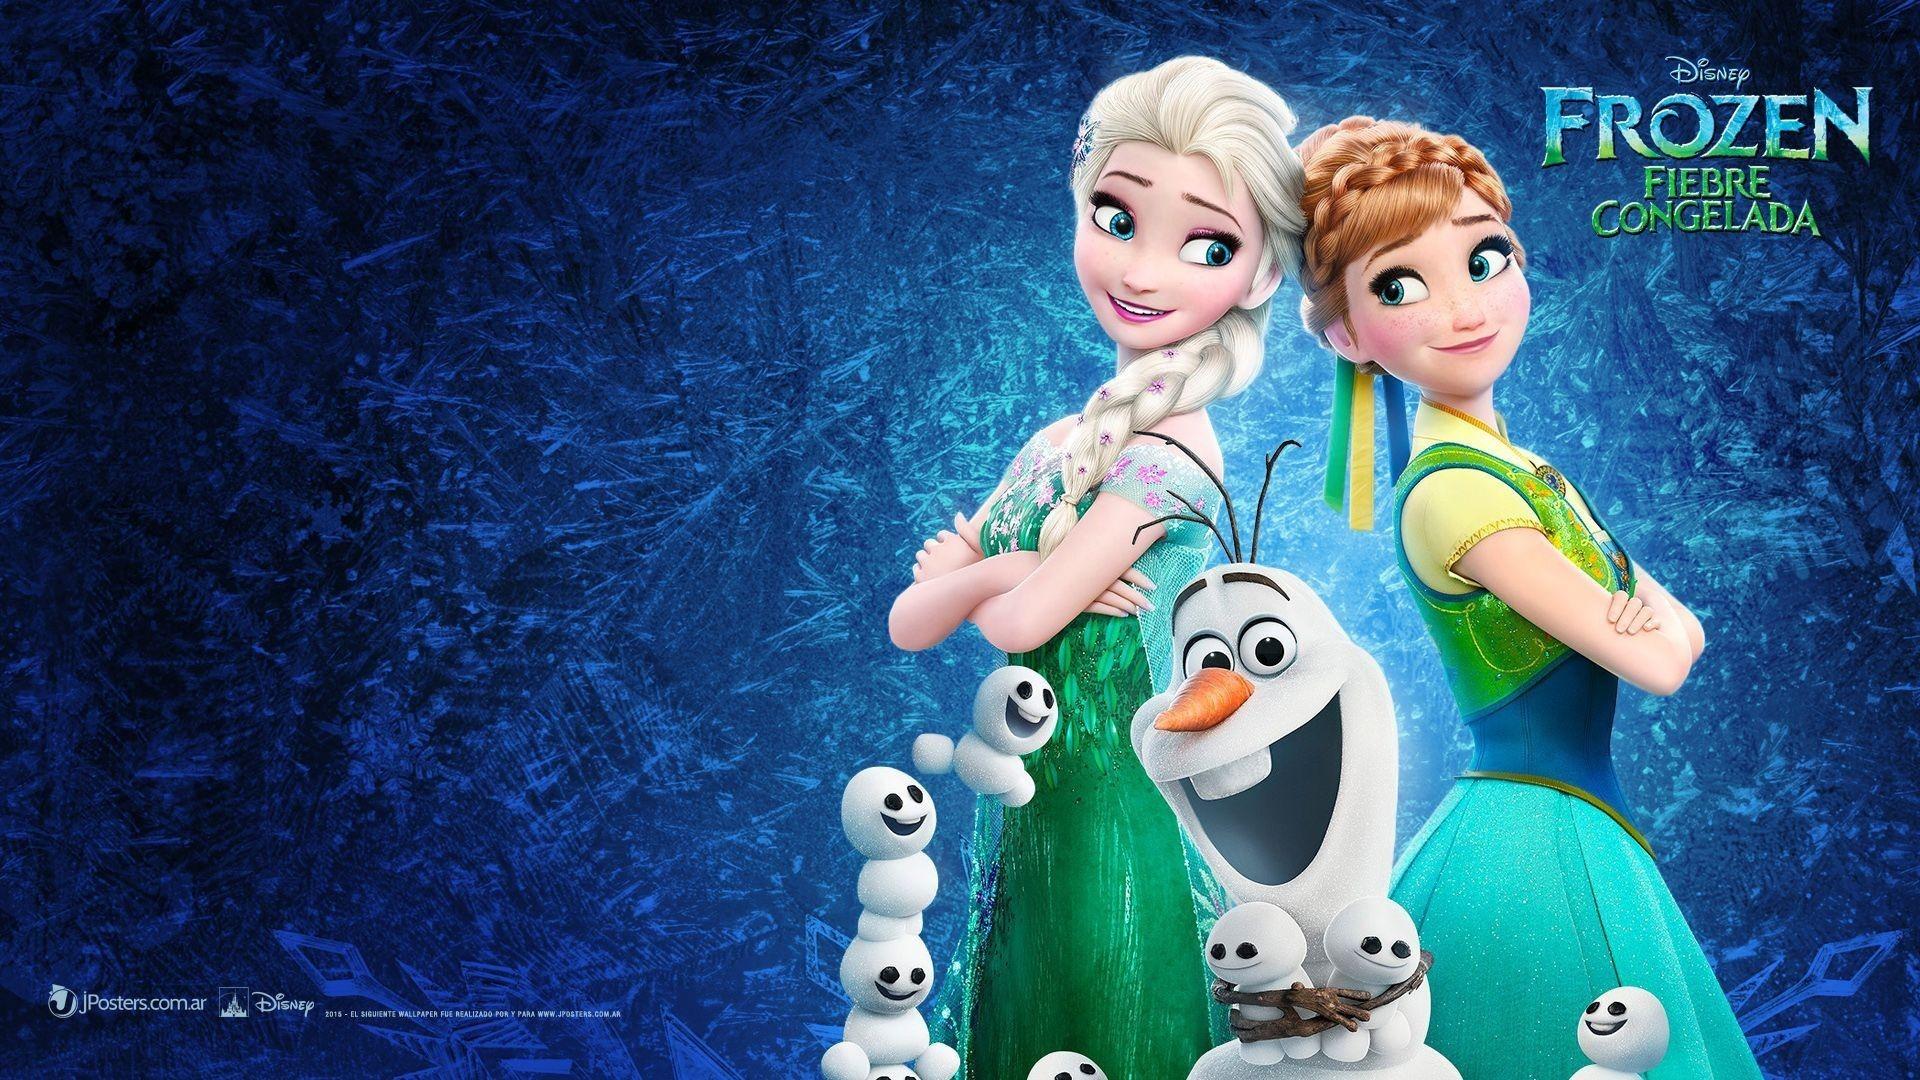 Frozen 2 hd wallpaper download